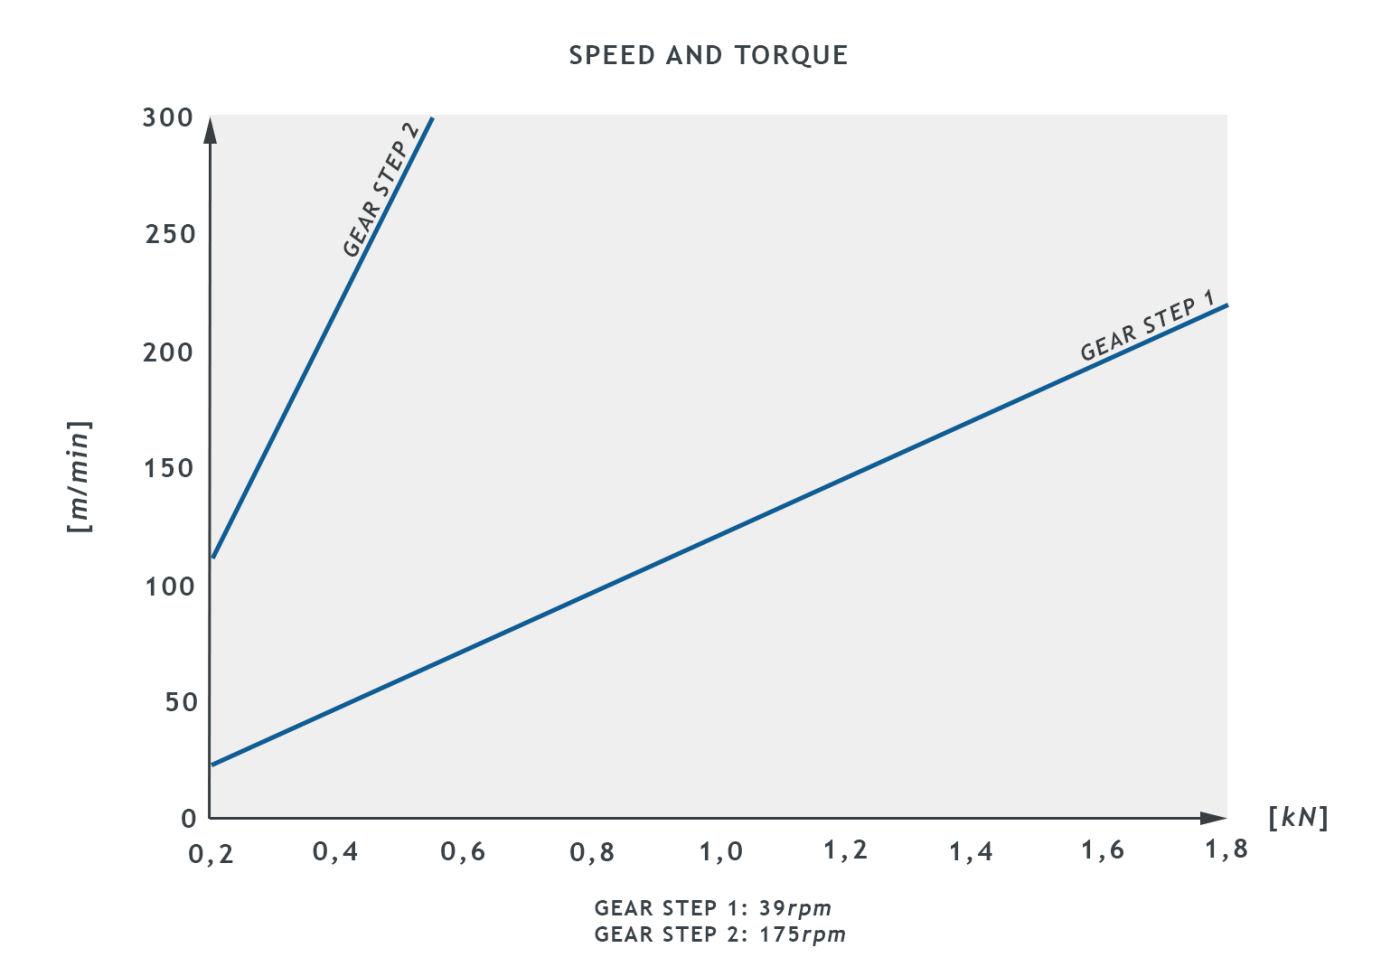 AVR3_SB0405001_SpeedTorque_graph1.jpg